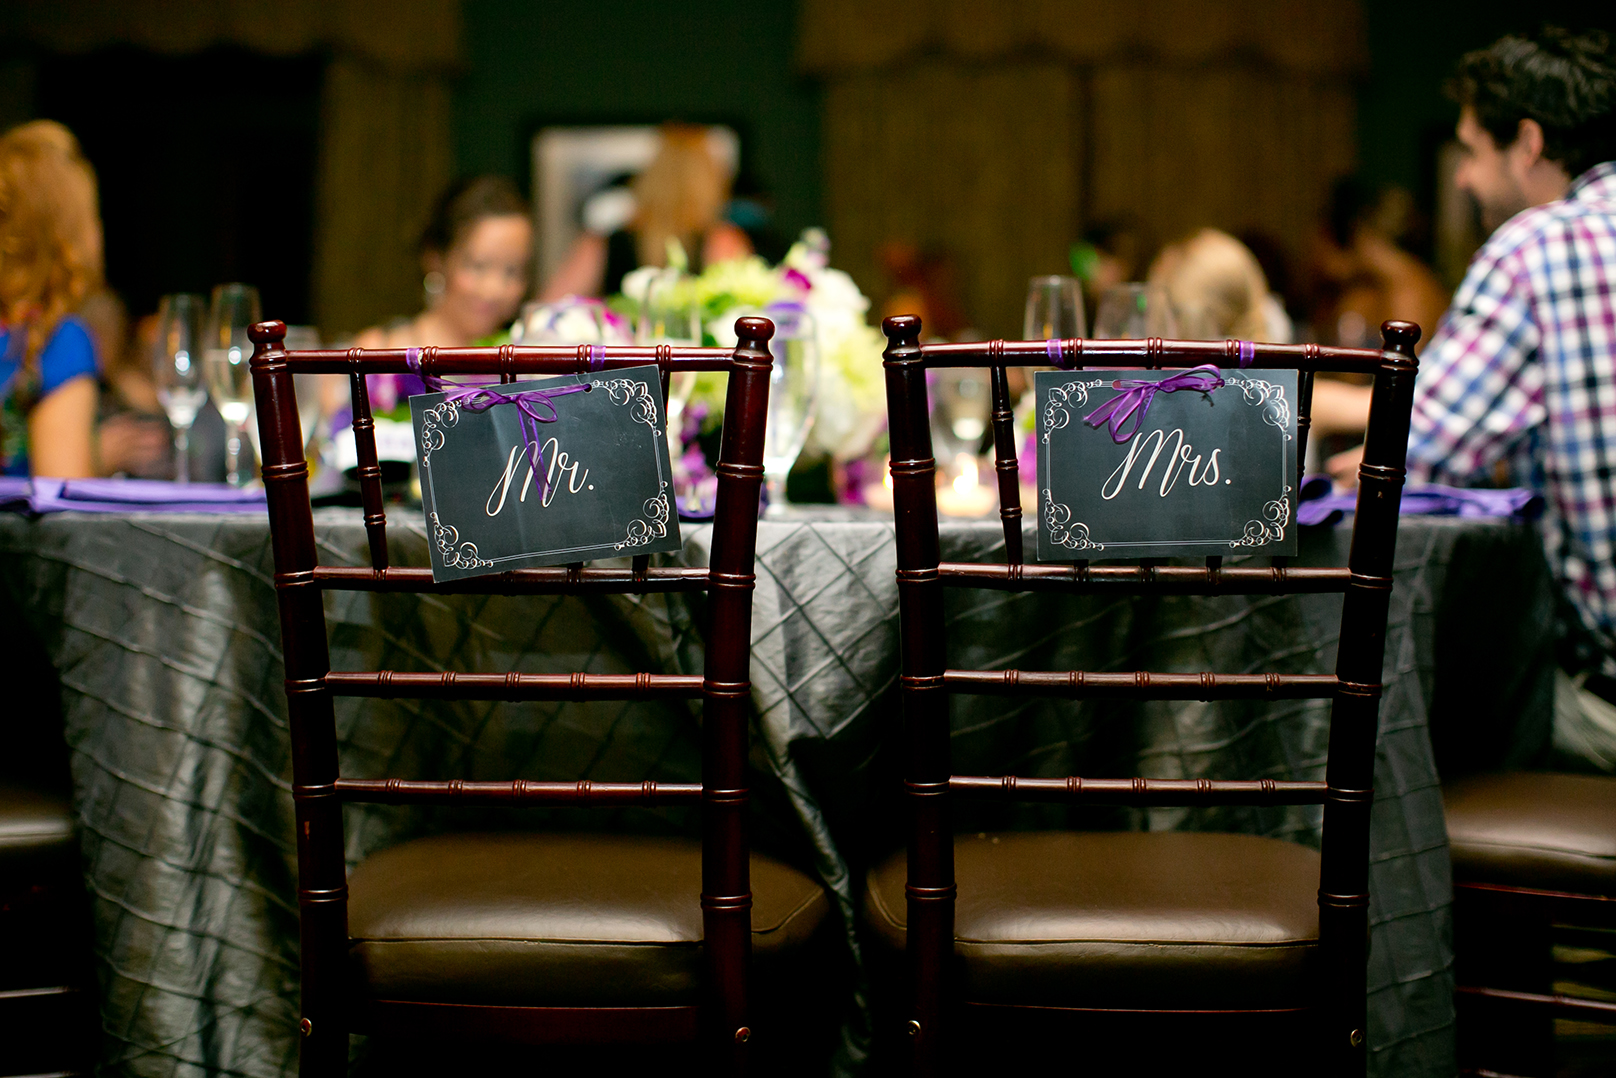 adam-szarmack-tpc-sawgrass-ponte-vedra-wedding-photographer-PZ3A9841.jpg